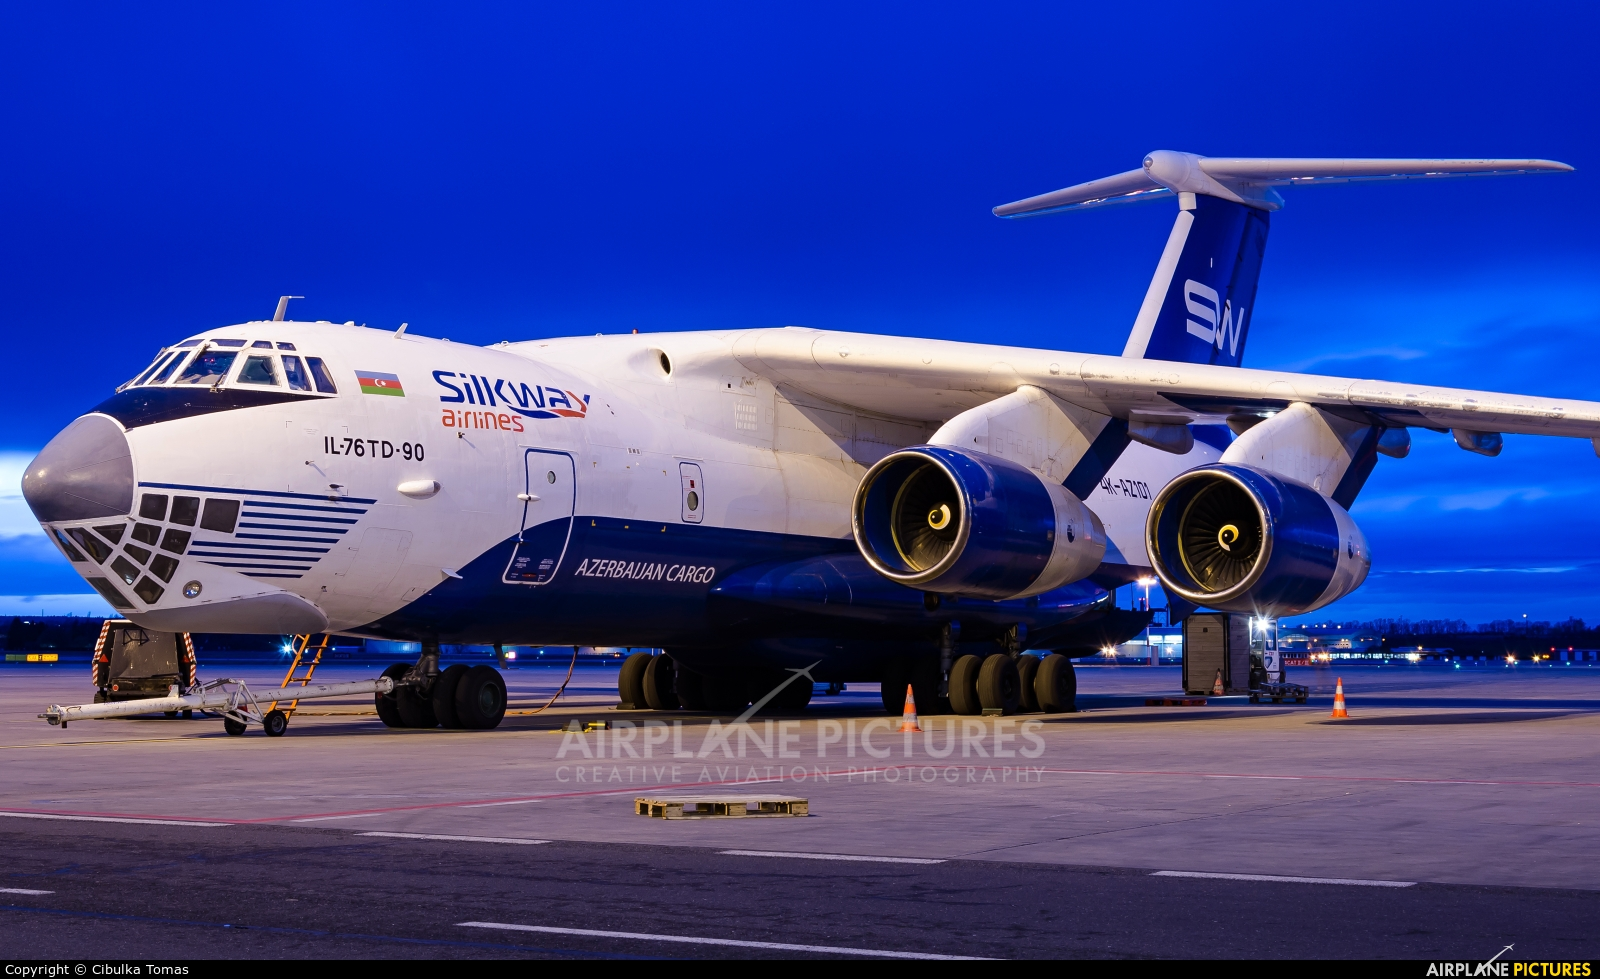 Silk Way Airlines 4K-AZ101 aircraft at Prague - Václav Havel